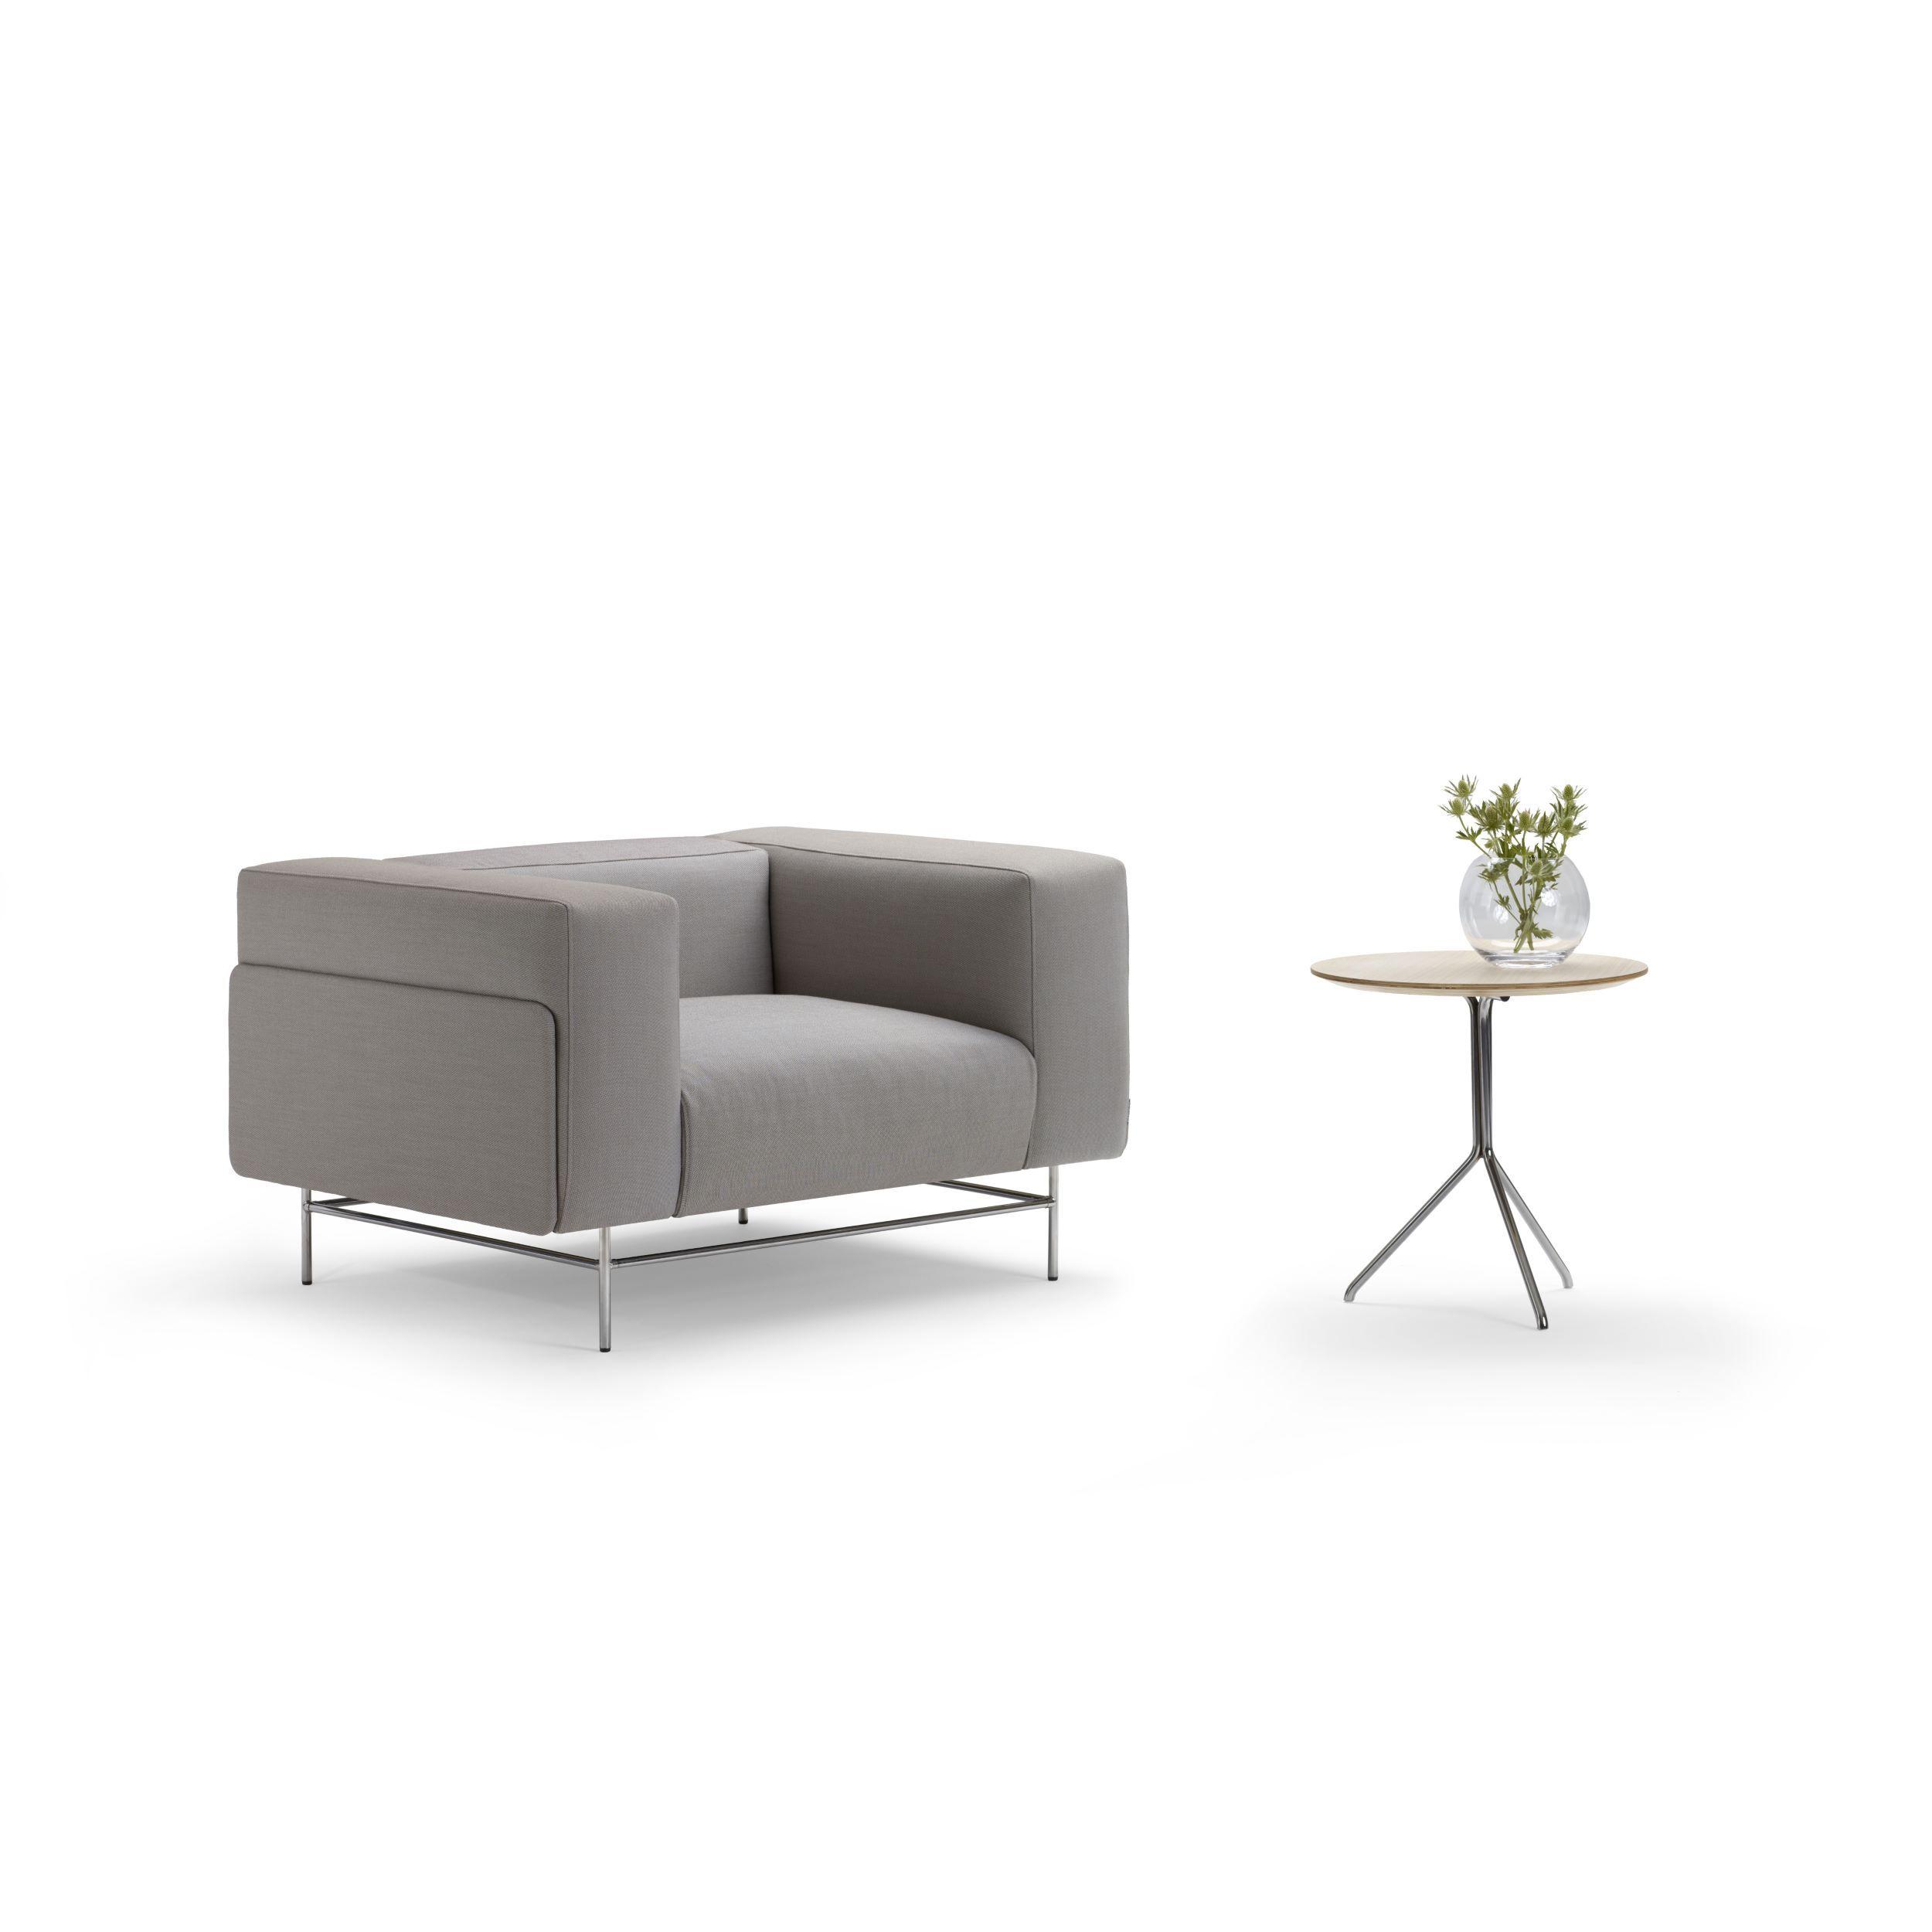 Avignon Easy Chair Designed By Christophe Pillet Offecct  # Muebles Bop Concept